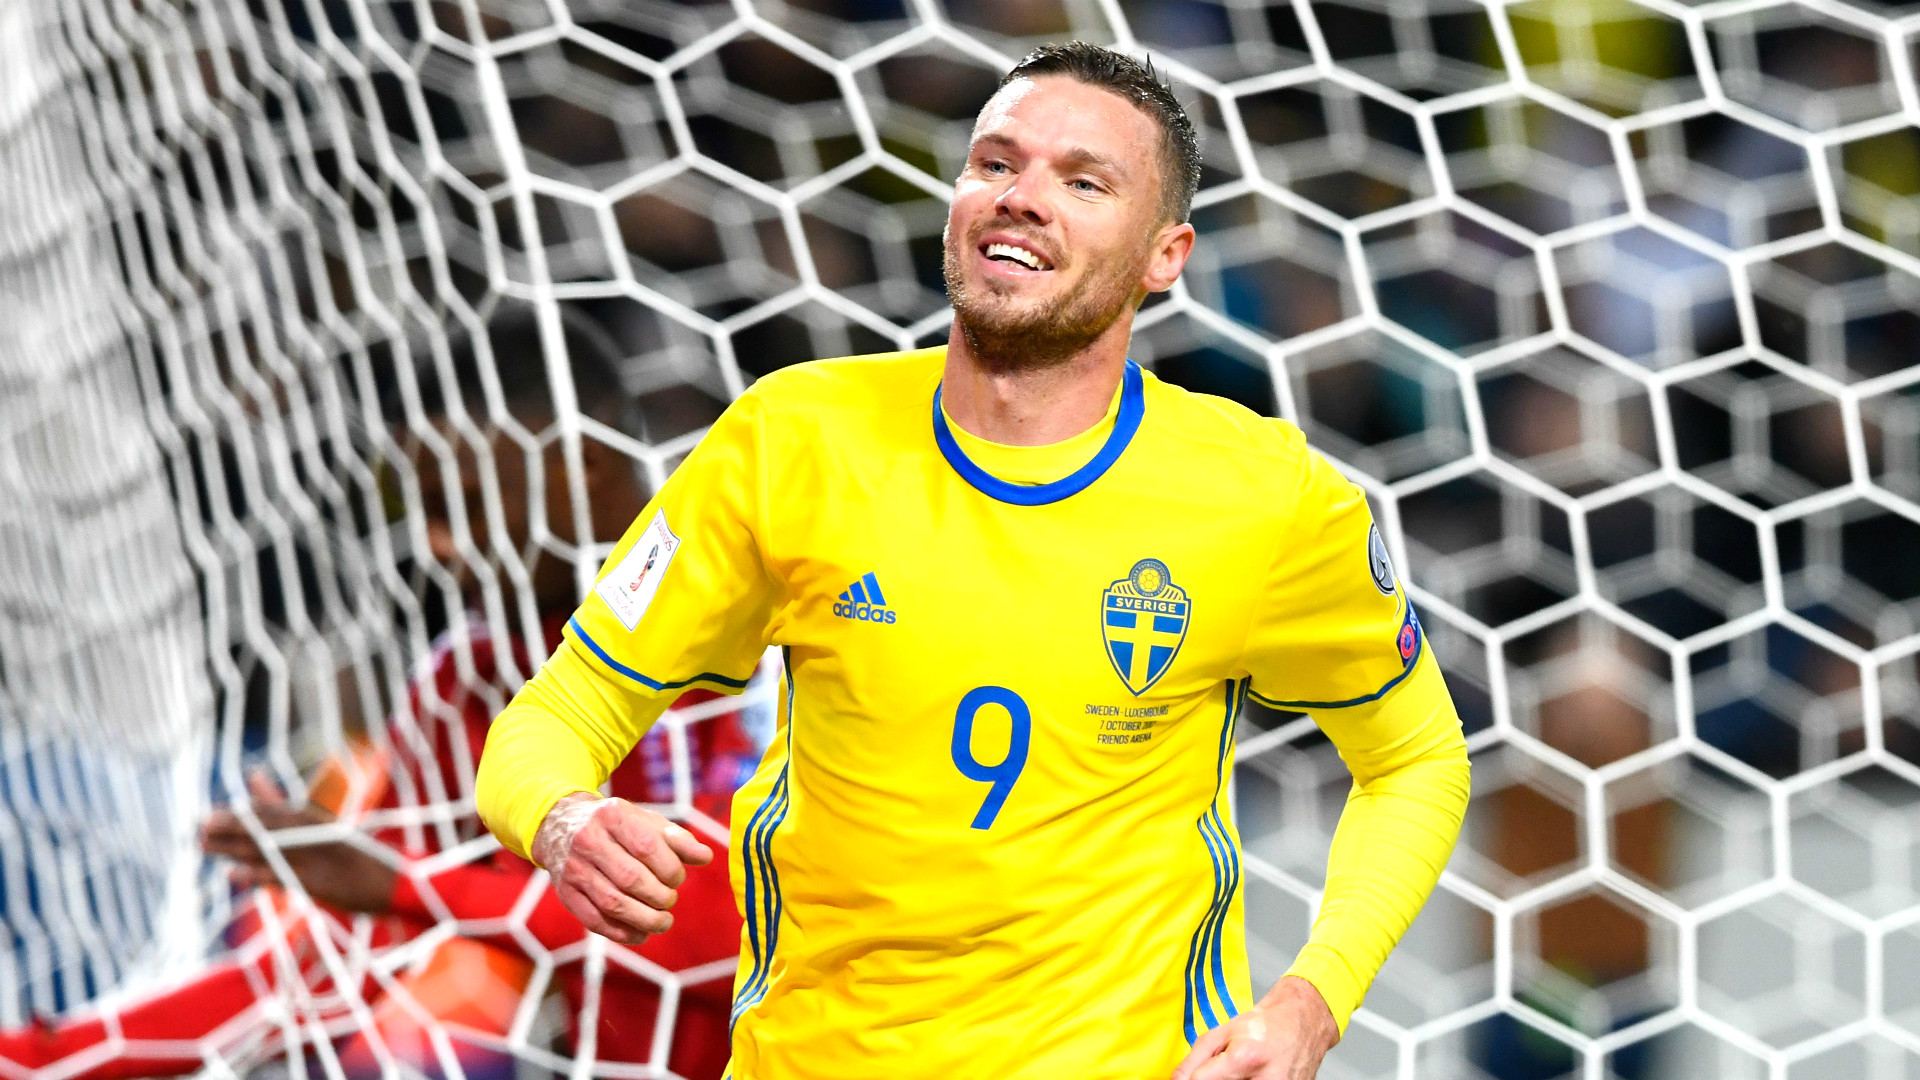 Svezia-Italia, Ibrahimovic: